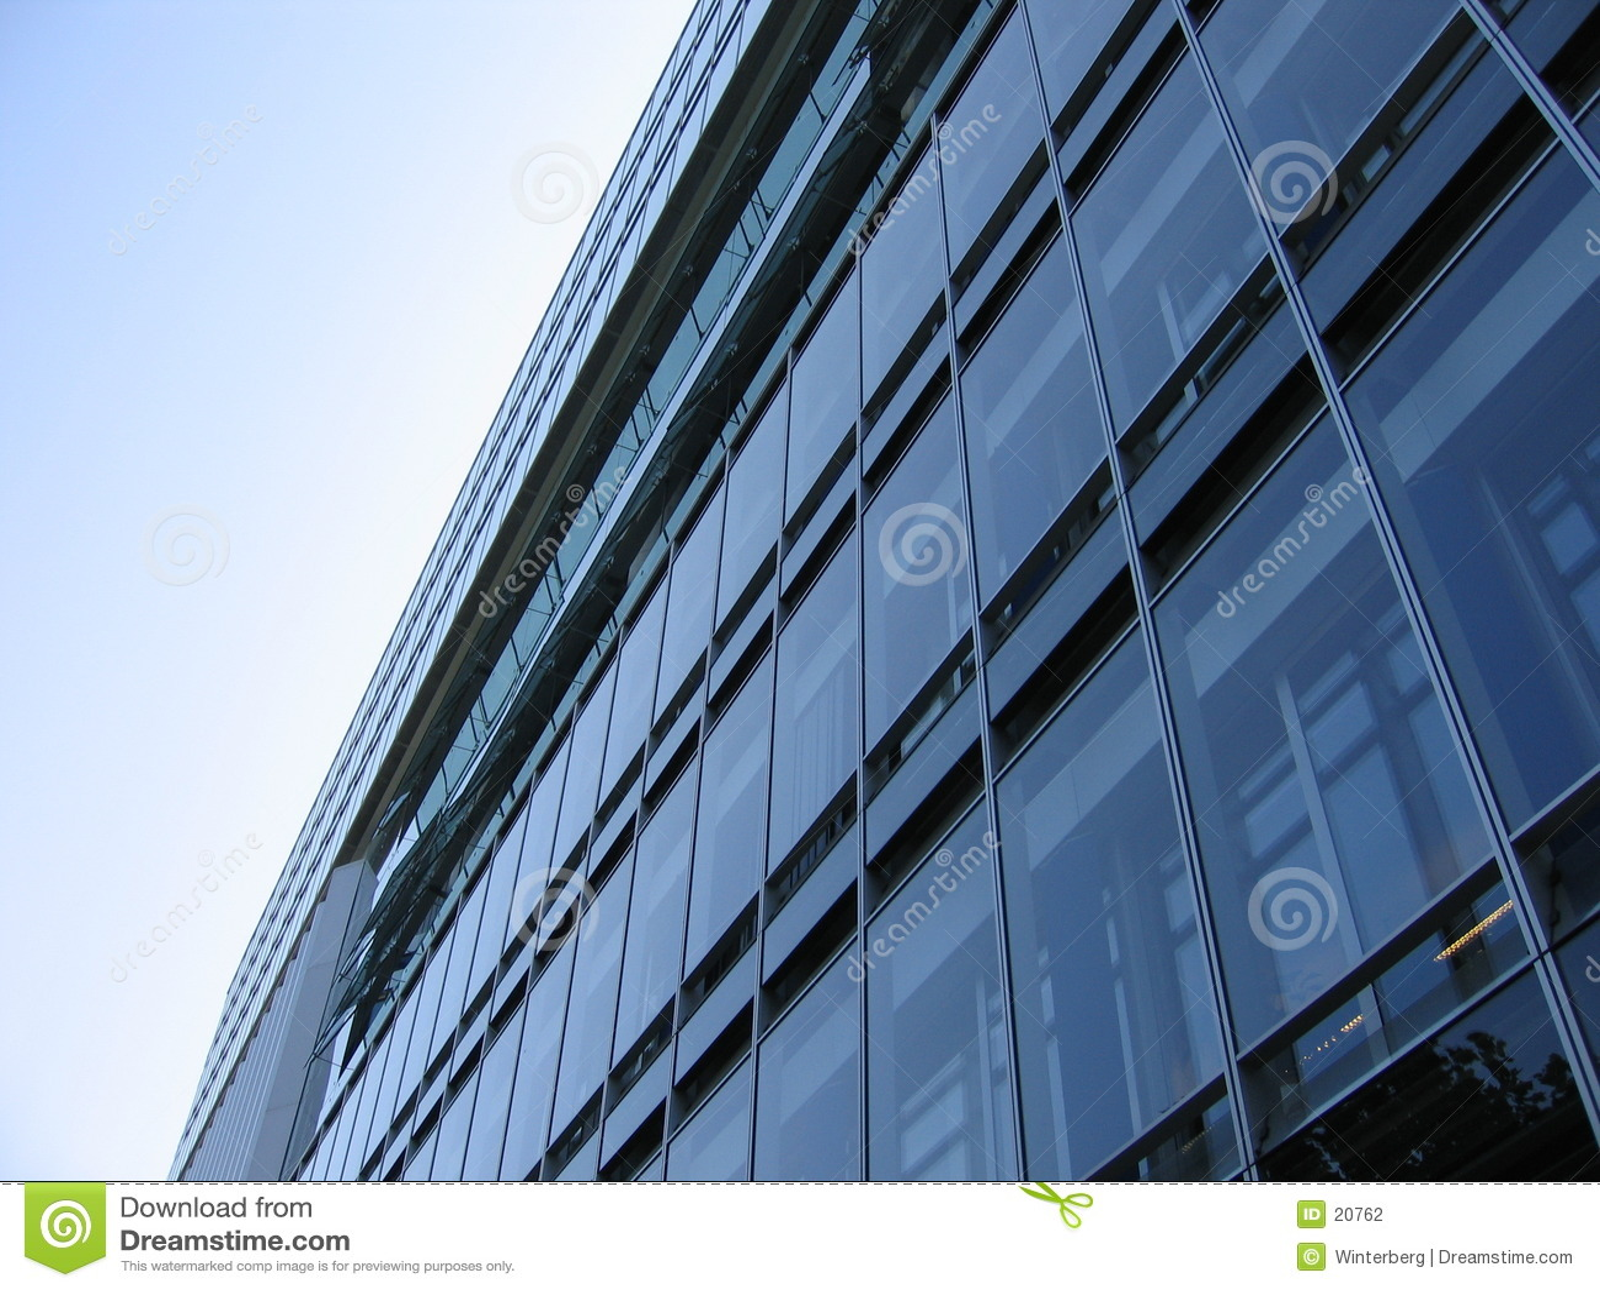 стекло фасада здания